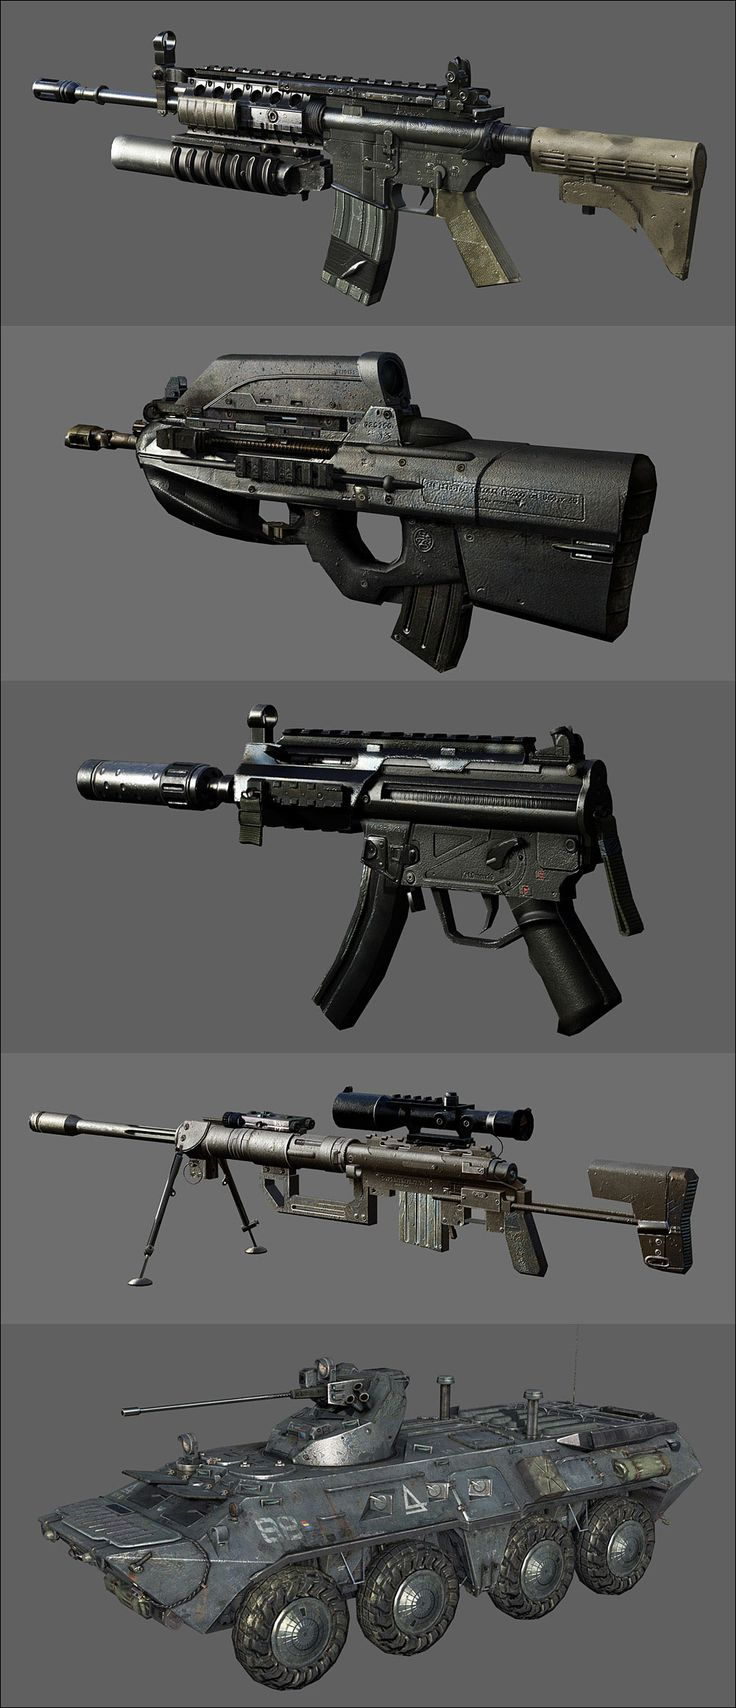 Call Of Duty : Modern Warfare 2 weapon